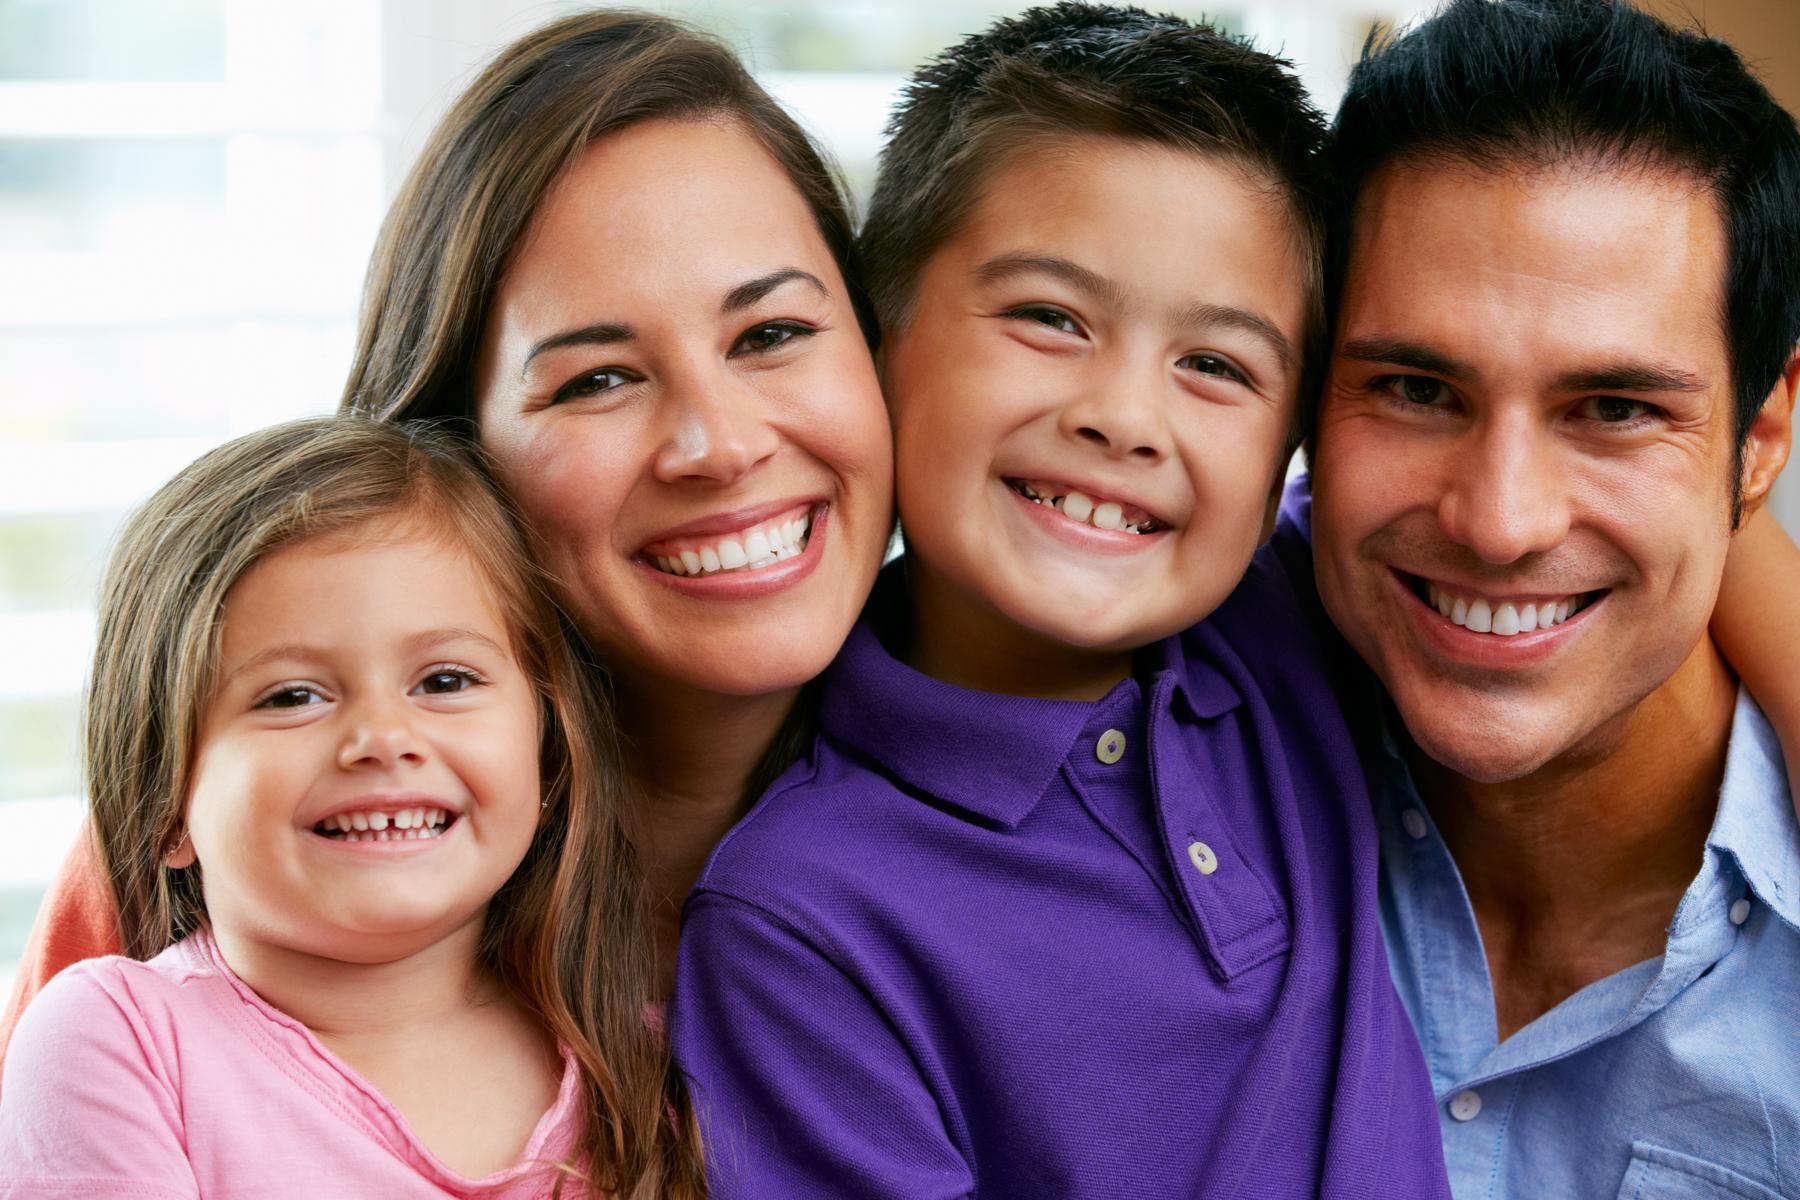 Young_Caucasian_Family_4.jpg